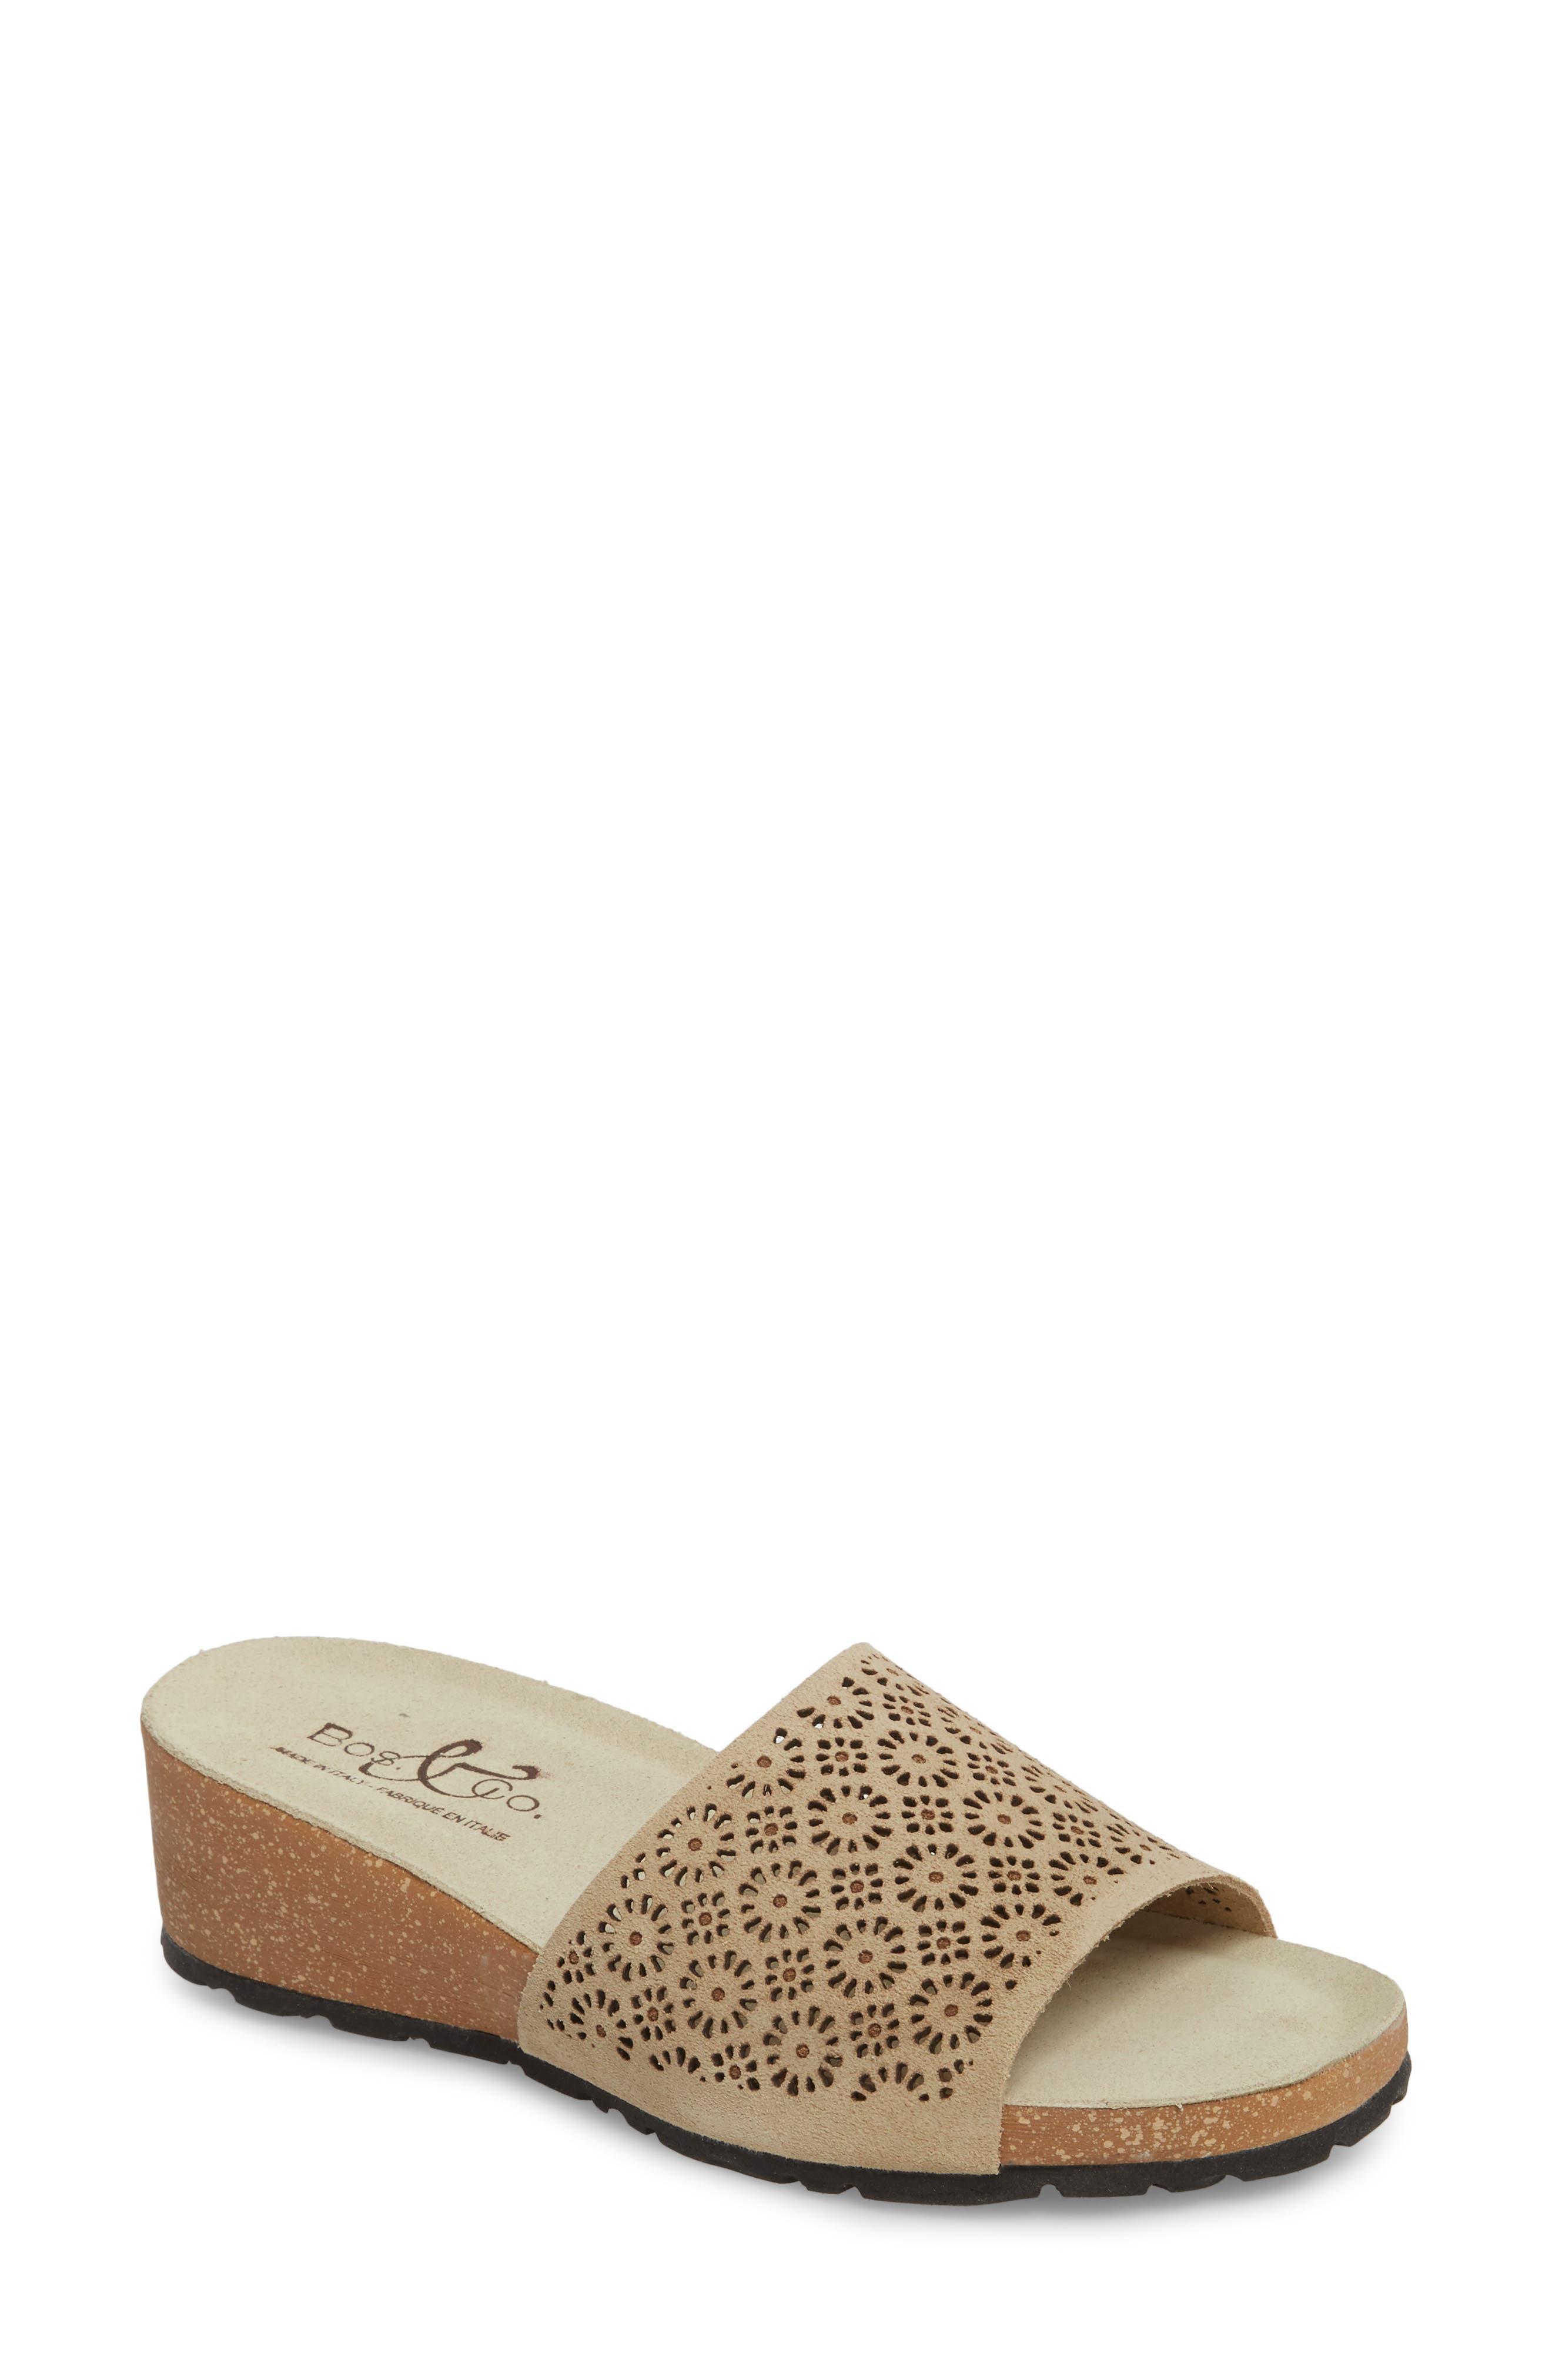 Bos. & Co. Loa Wedge Slide Sandal - Beige